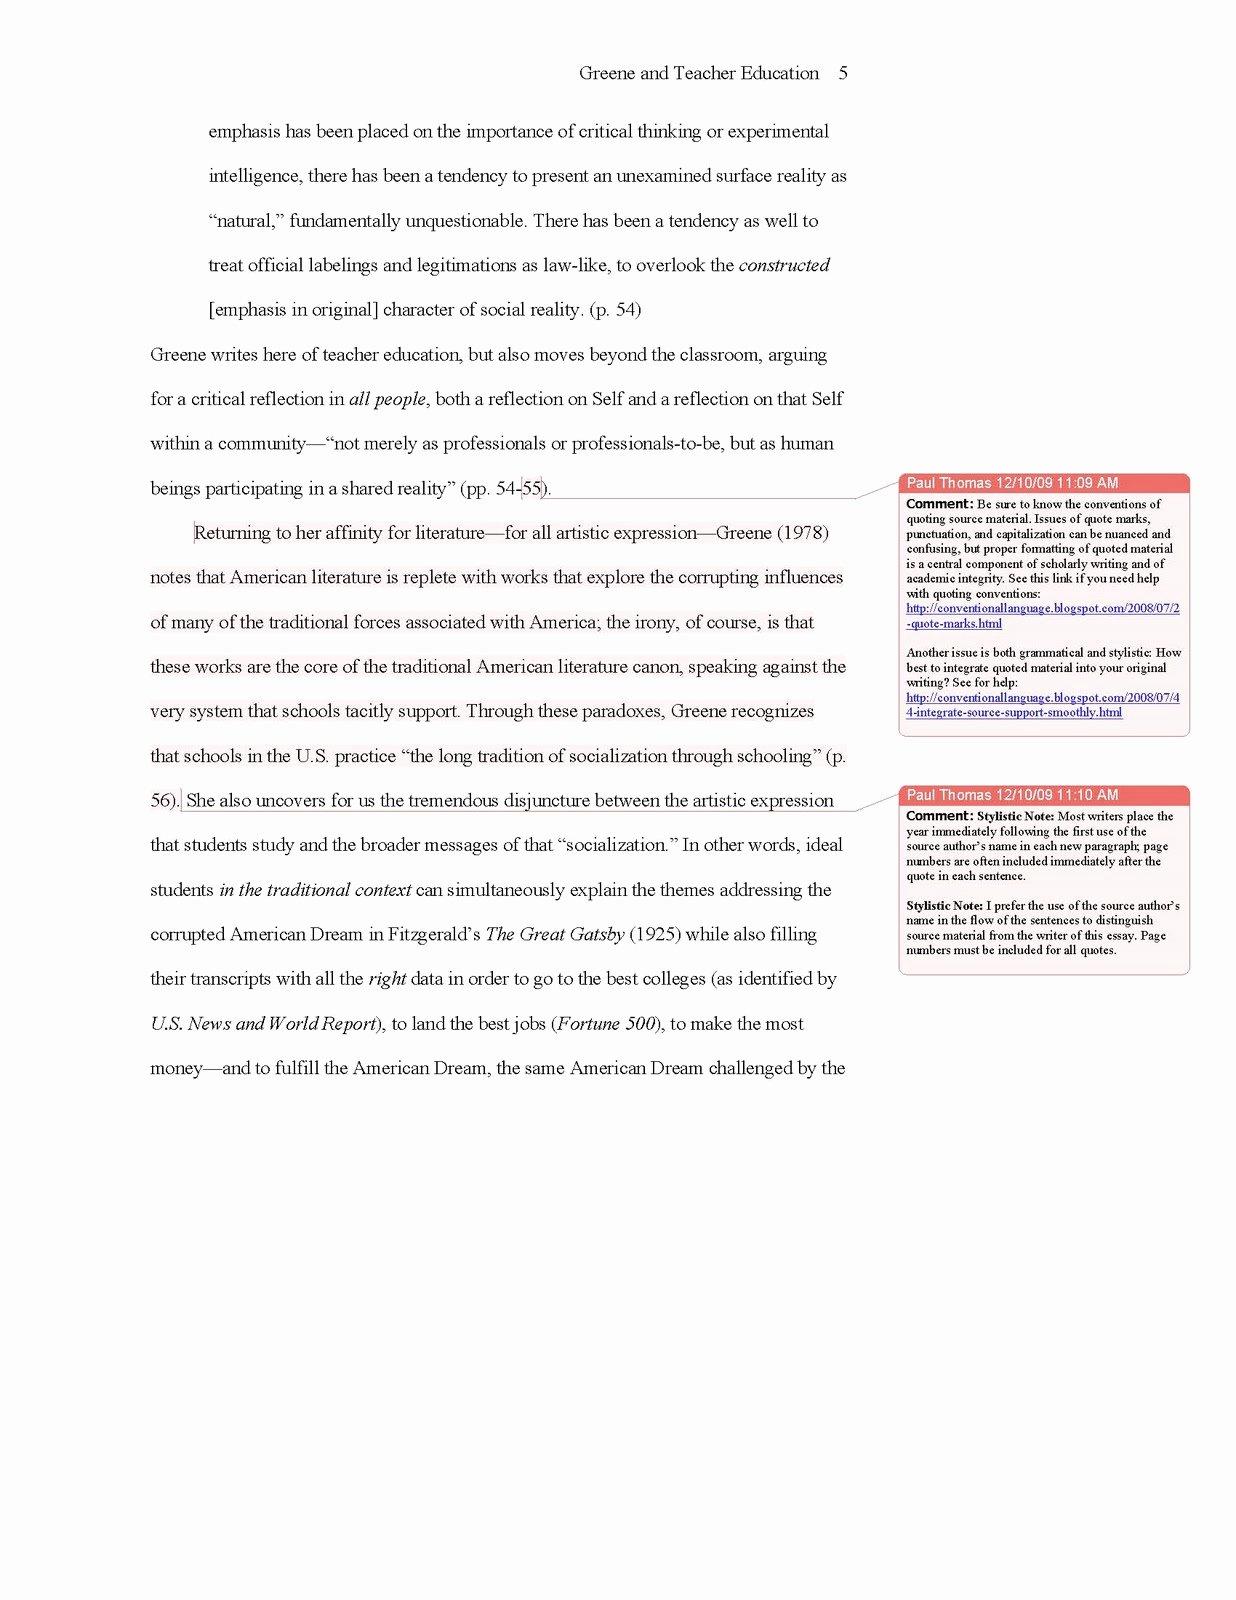 College Essay format Apa New Conventional Language